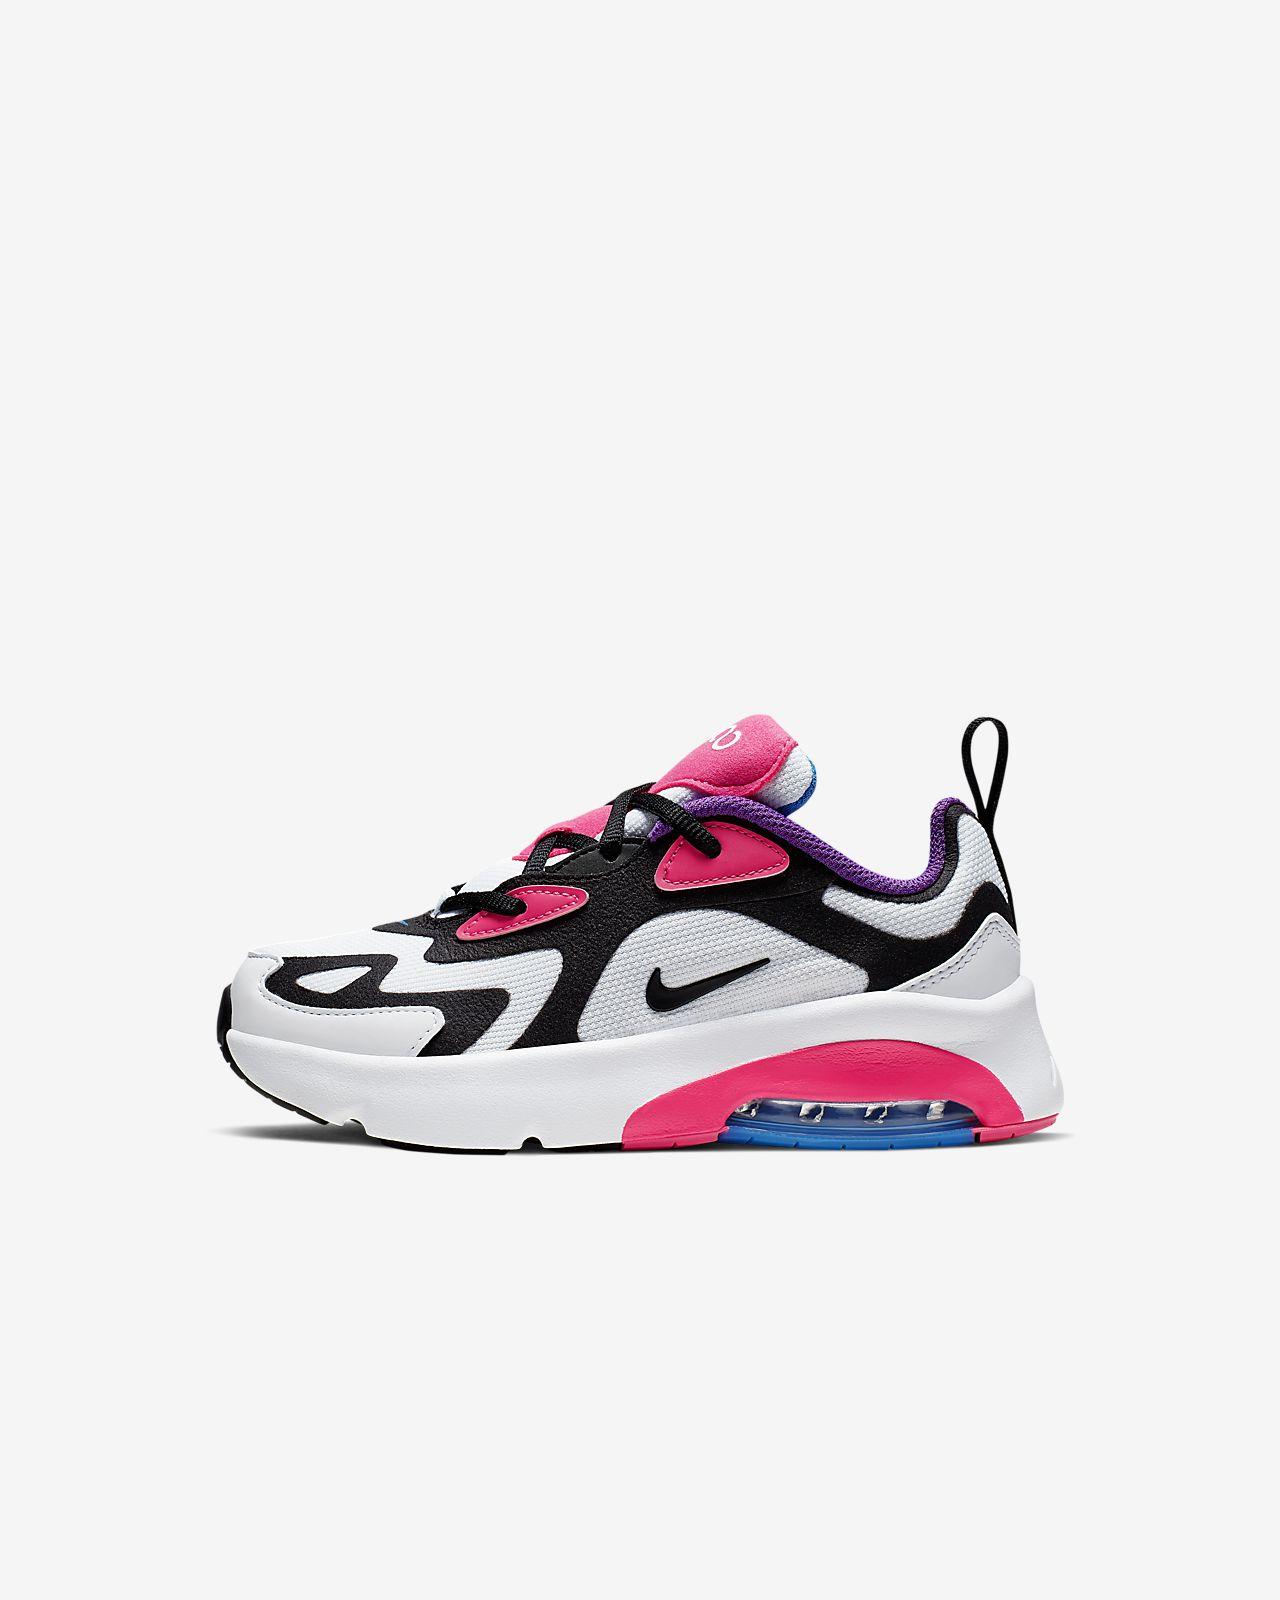 online for sale usa cheap sale new lower prices Nike Air Max 200 Schuh für jüngere Kinder